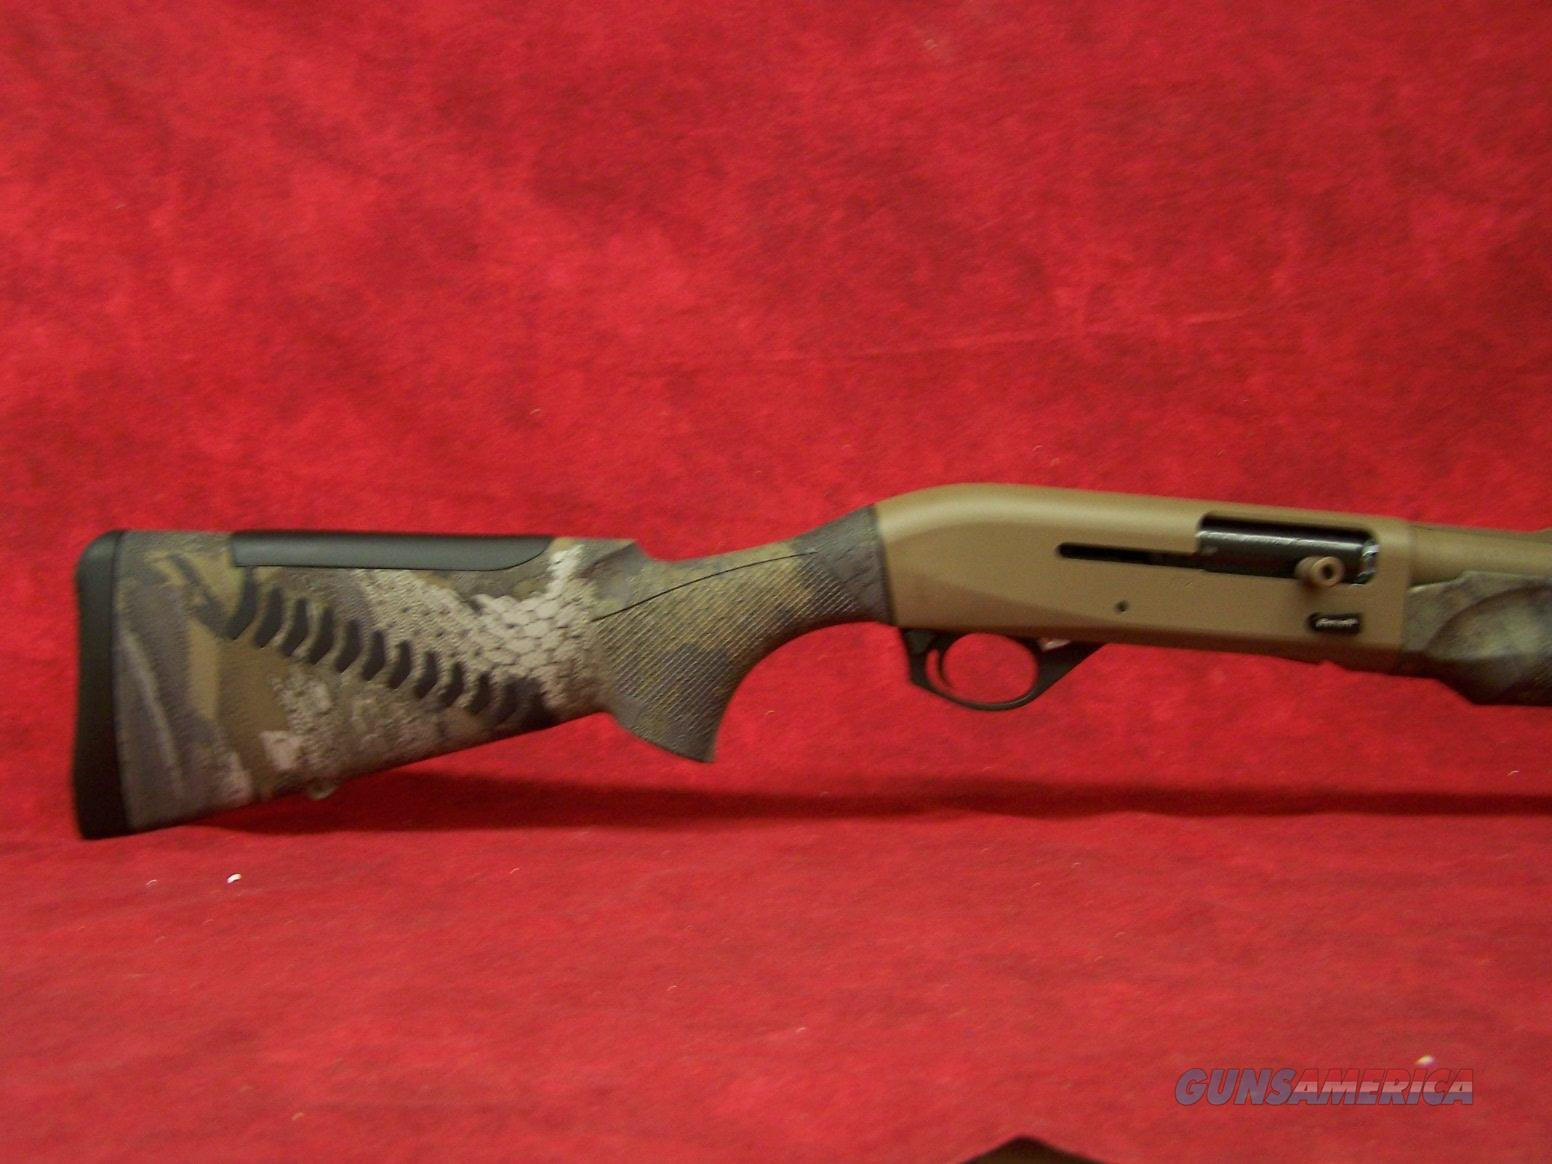 "Benelli M2 Waterfowl Performance Shop 12 Ga 28"" Barrel OPTIFADE Waterfowl Timber/Texas Tan Cerakote (11007)  Guns > Shotguns > Benelli Shotguns > Sporting"